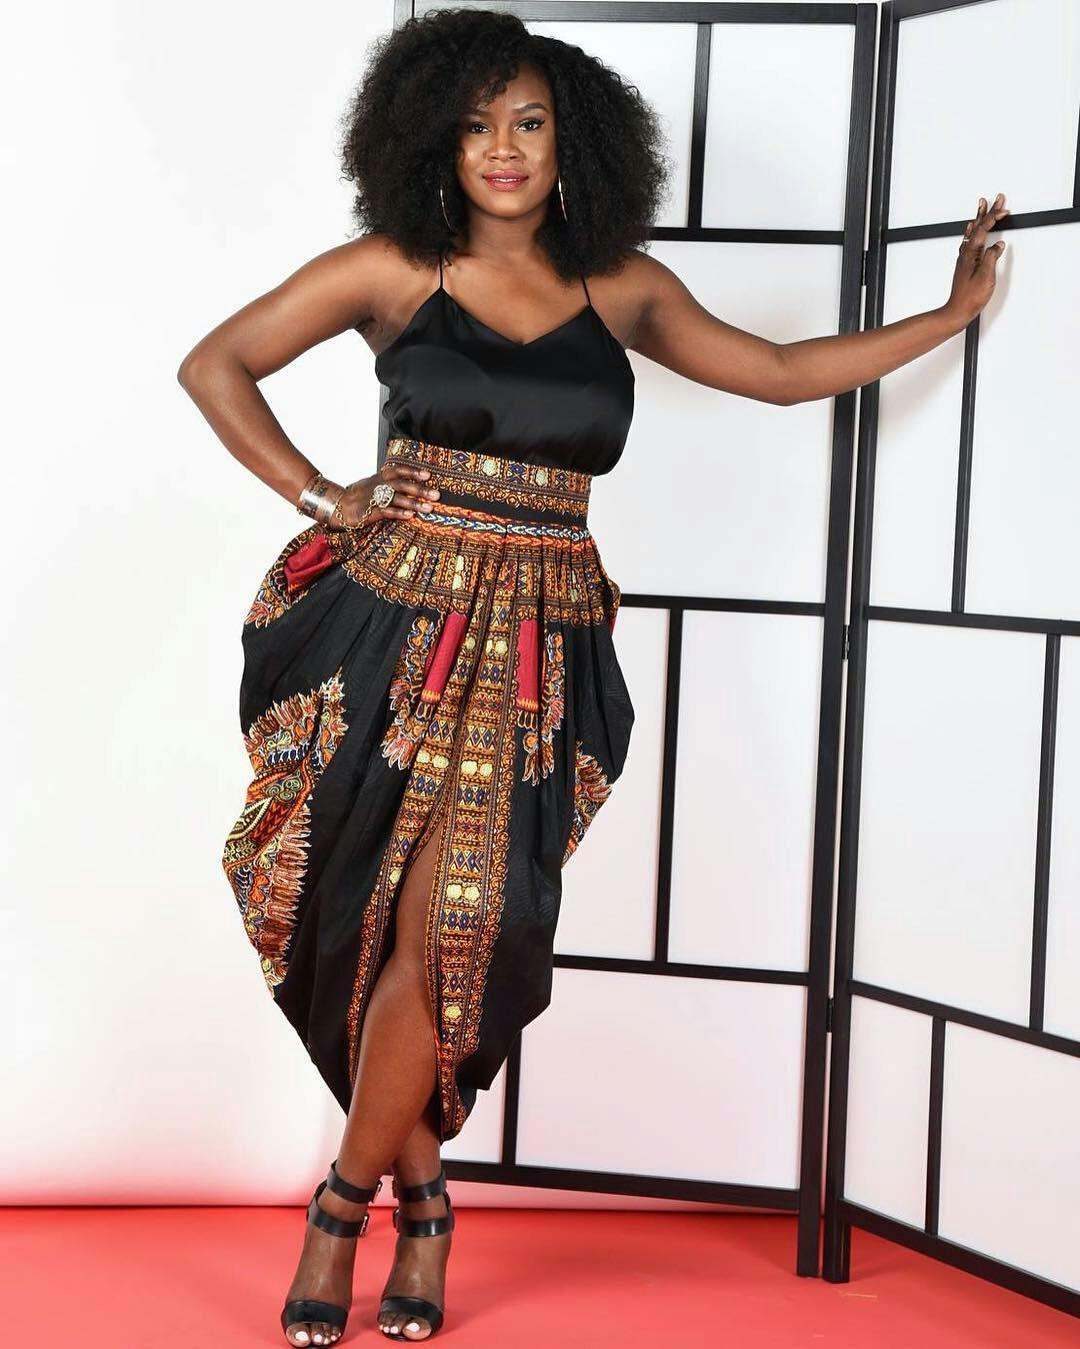 Dressing des 4 Saisons Zuvaa African style Dashiki Jupe noir sarouel Concours